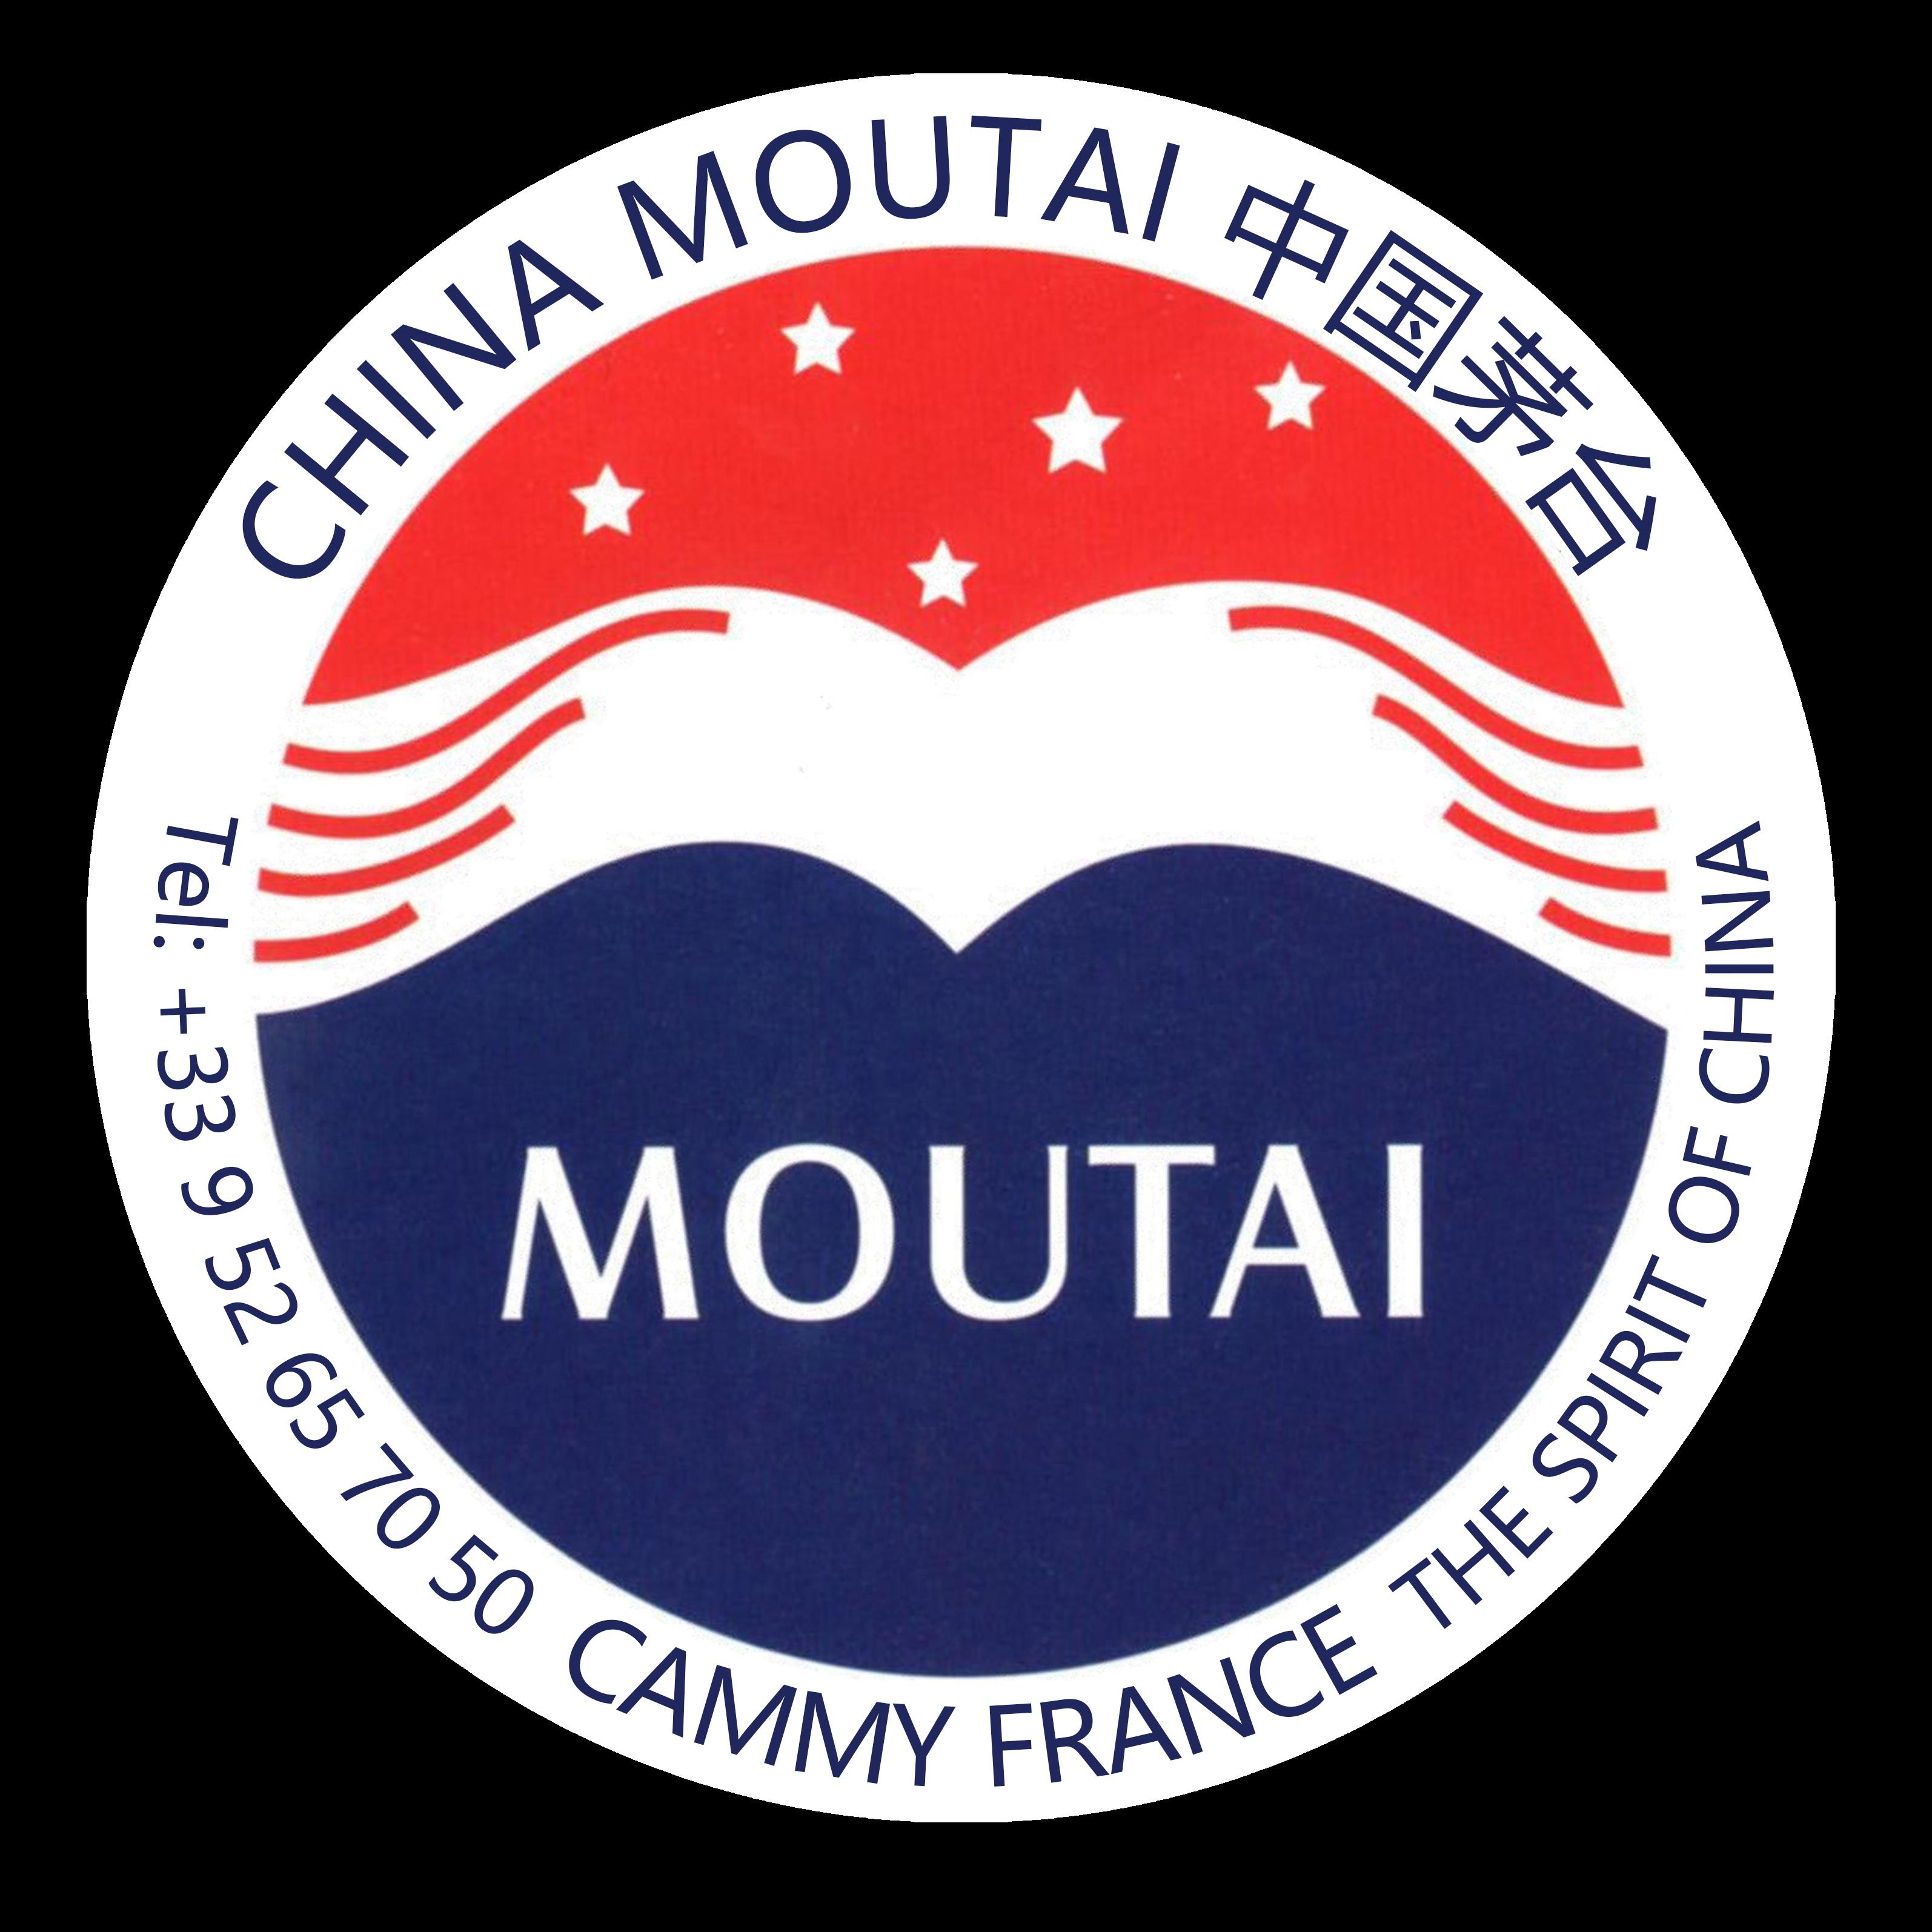 CHINA MOUTAI